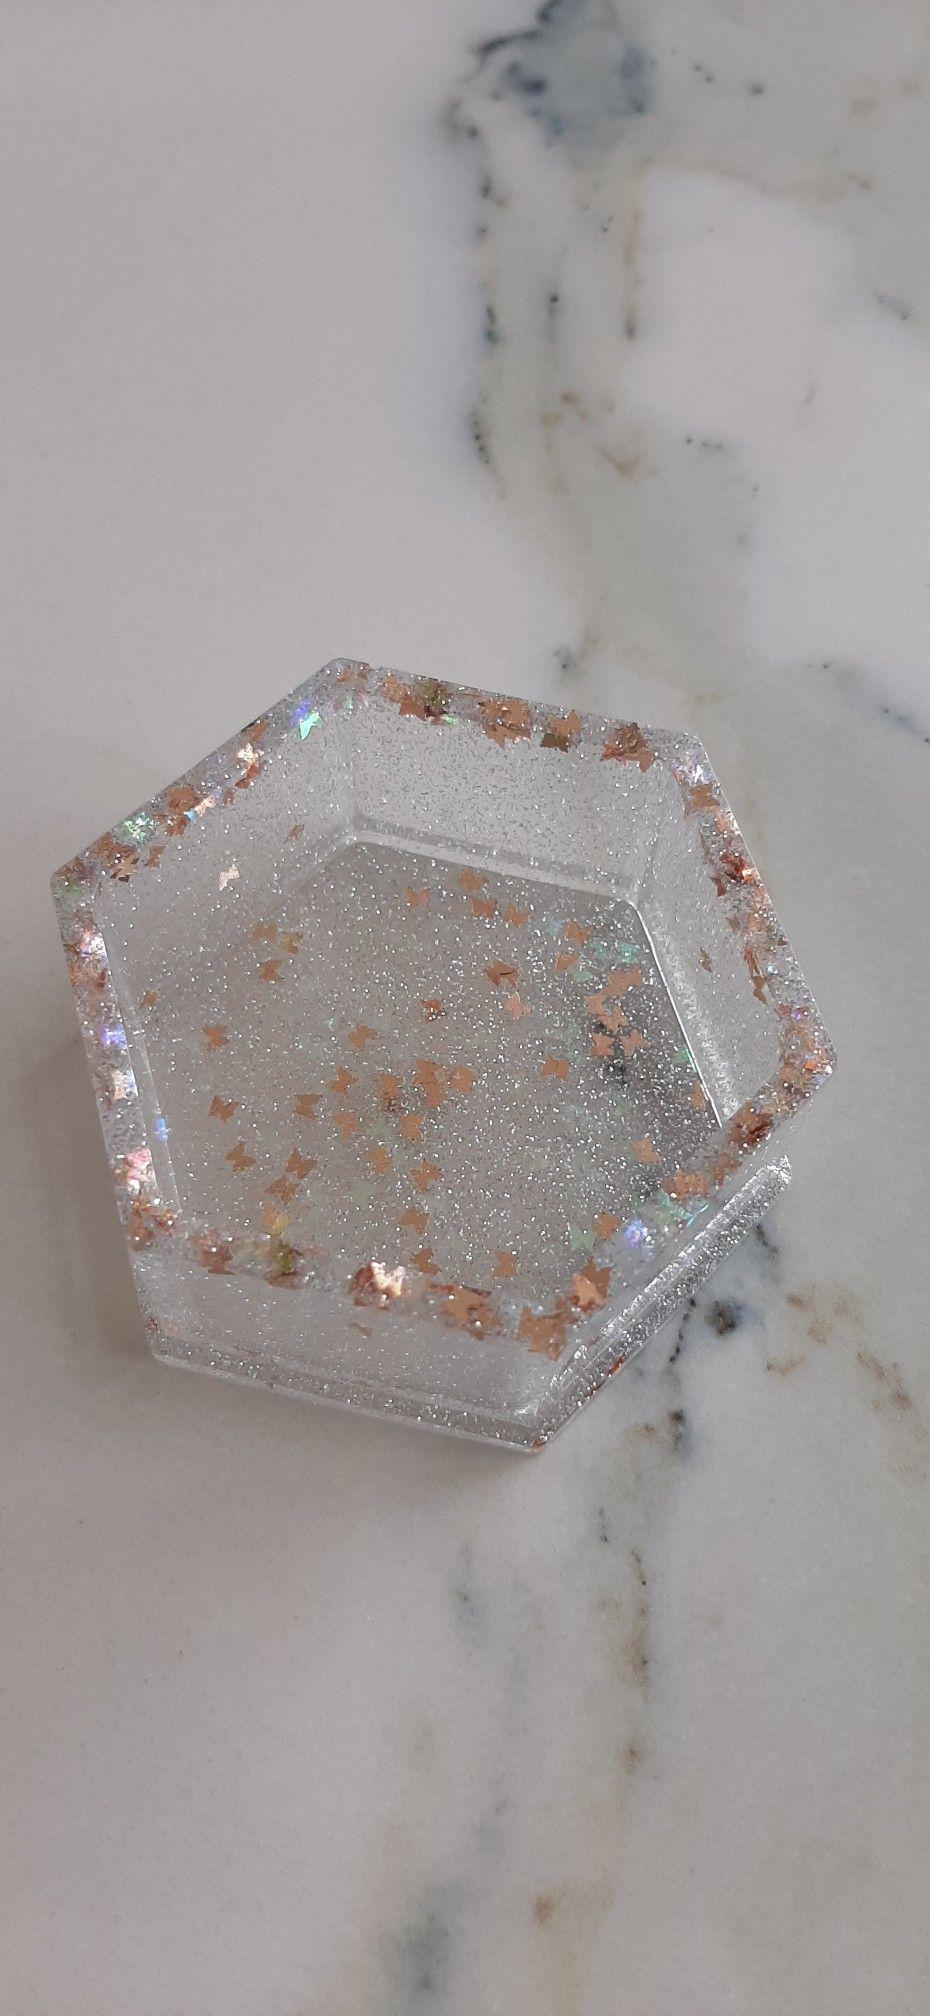 Resin jewellery box in 2020 Resin jewelry, Butterfly box